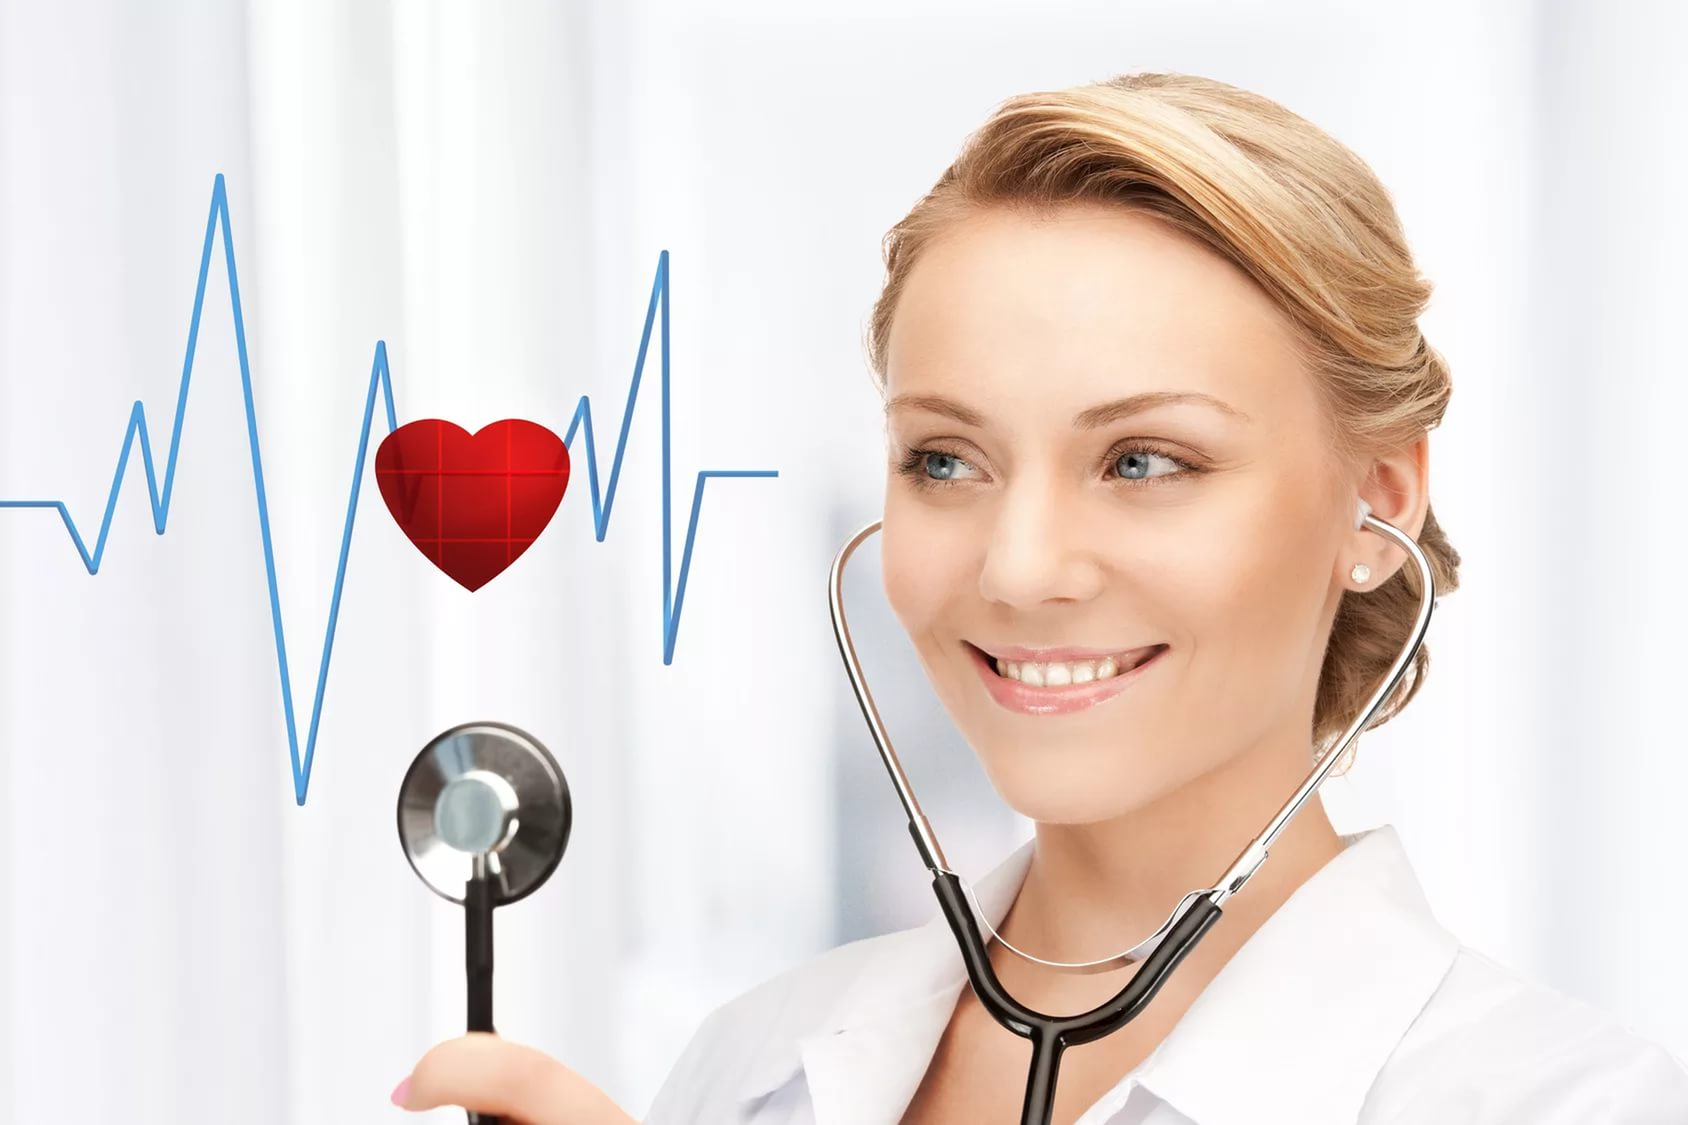 Услуги дерматолога (дерматовенеролога)